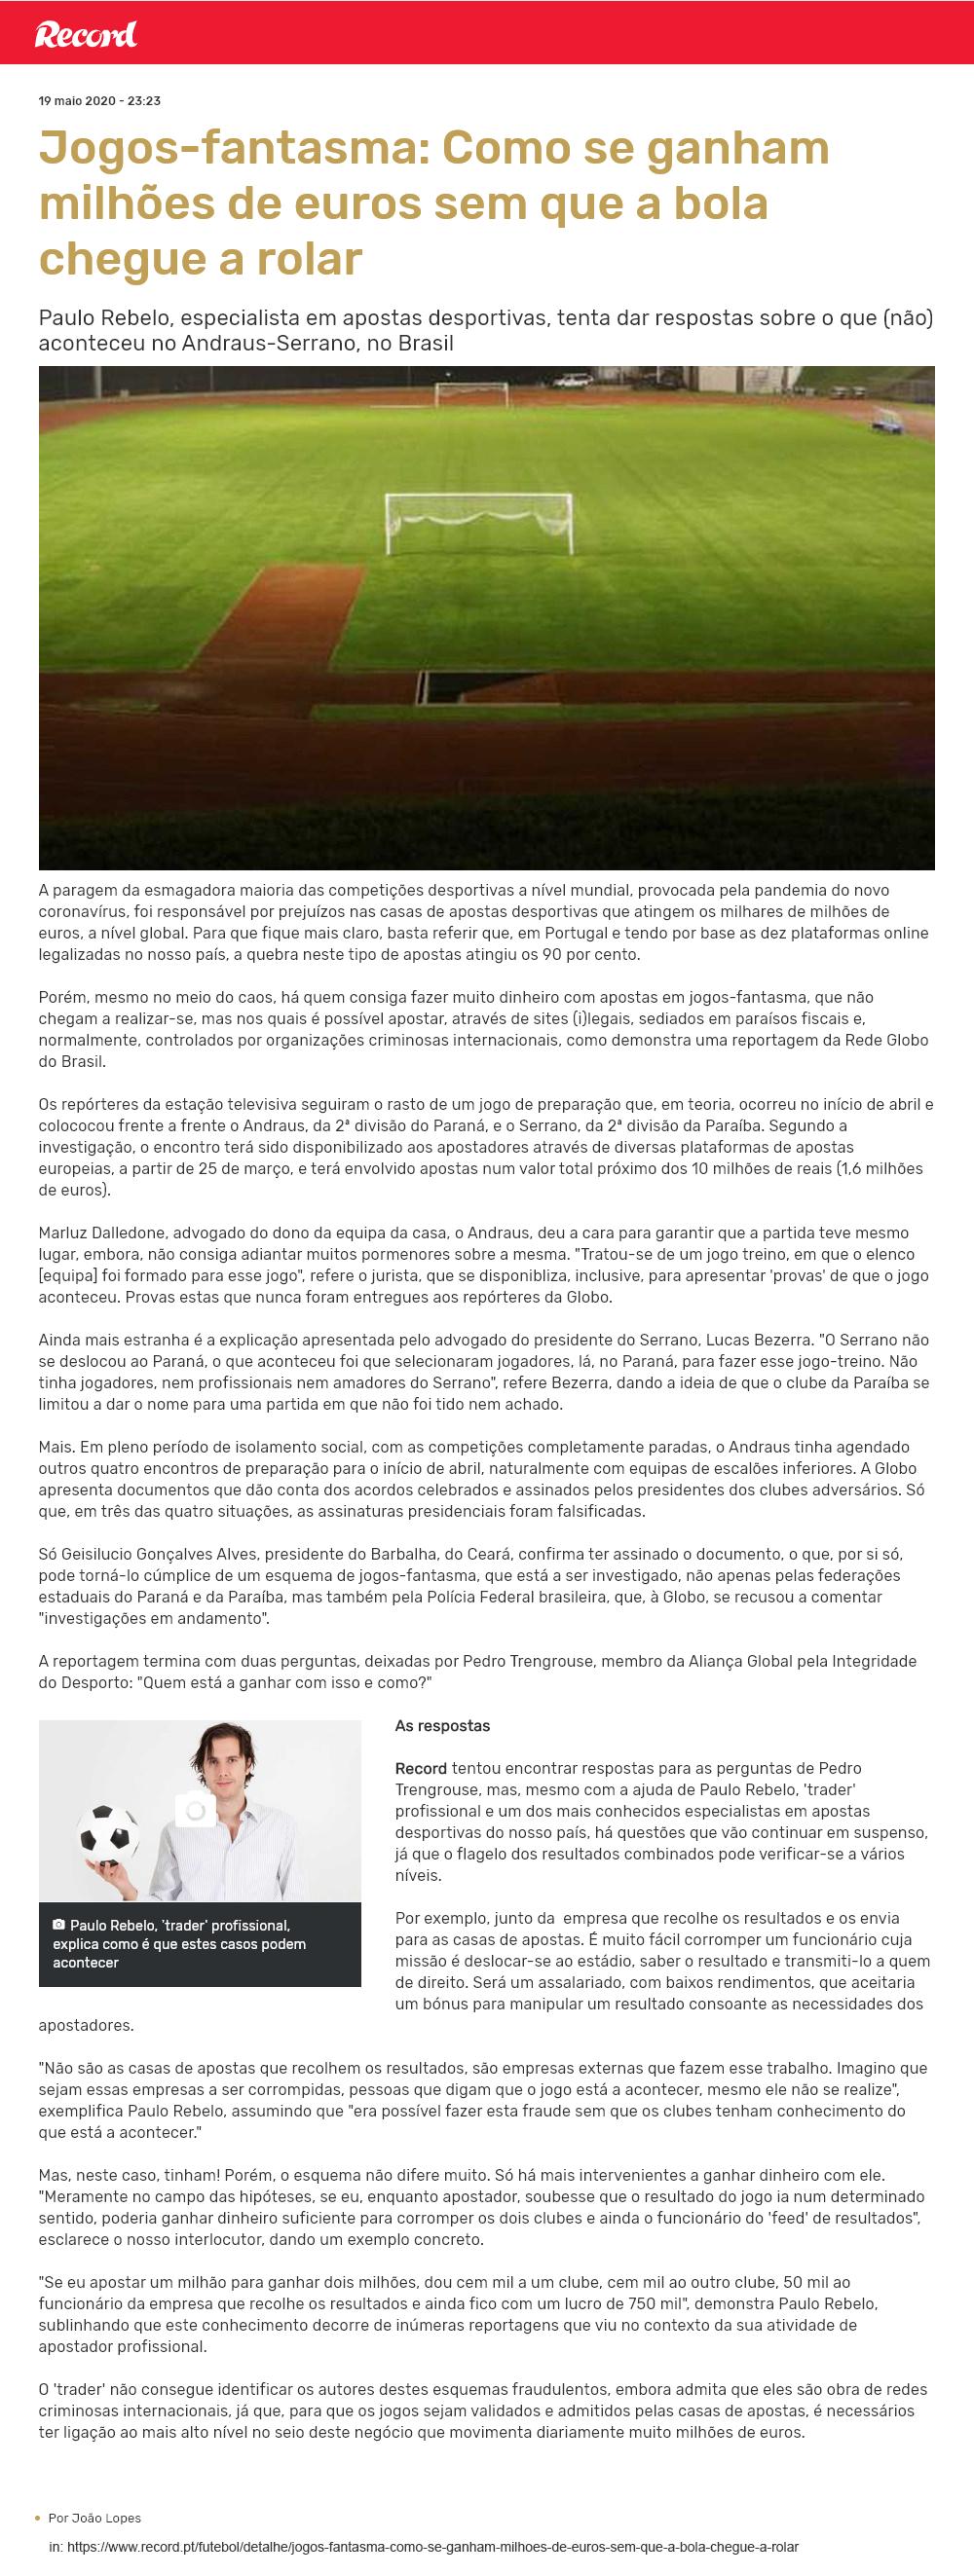 jogo-fantasma-movimenta-apostas-entrevista-paulo-rebelo-_-artigorecord